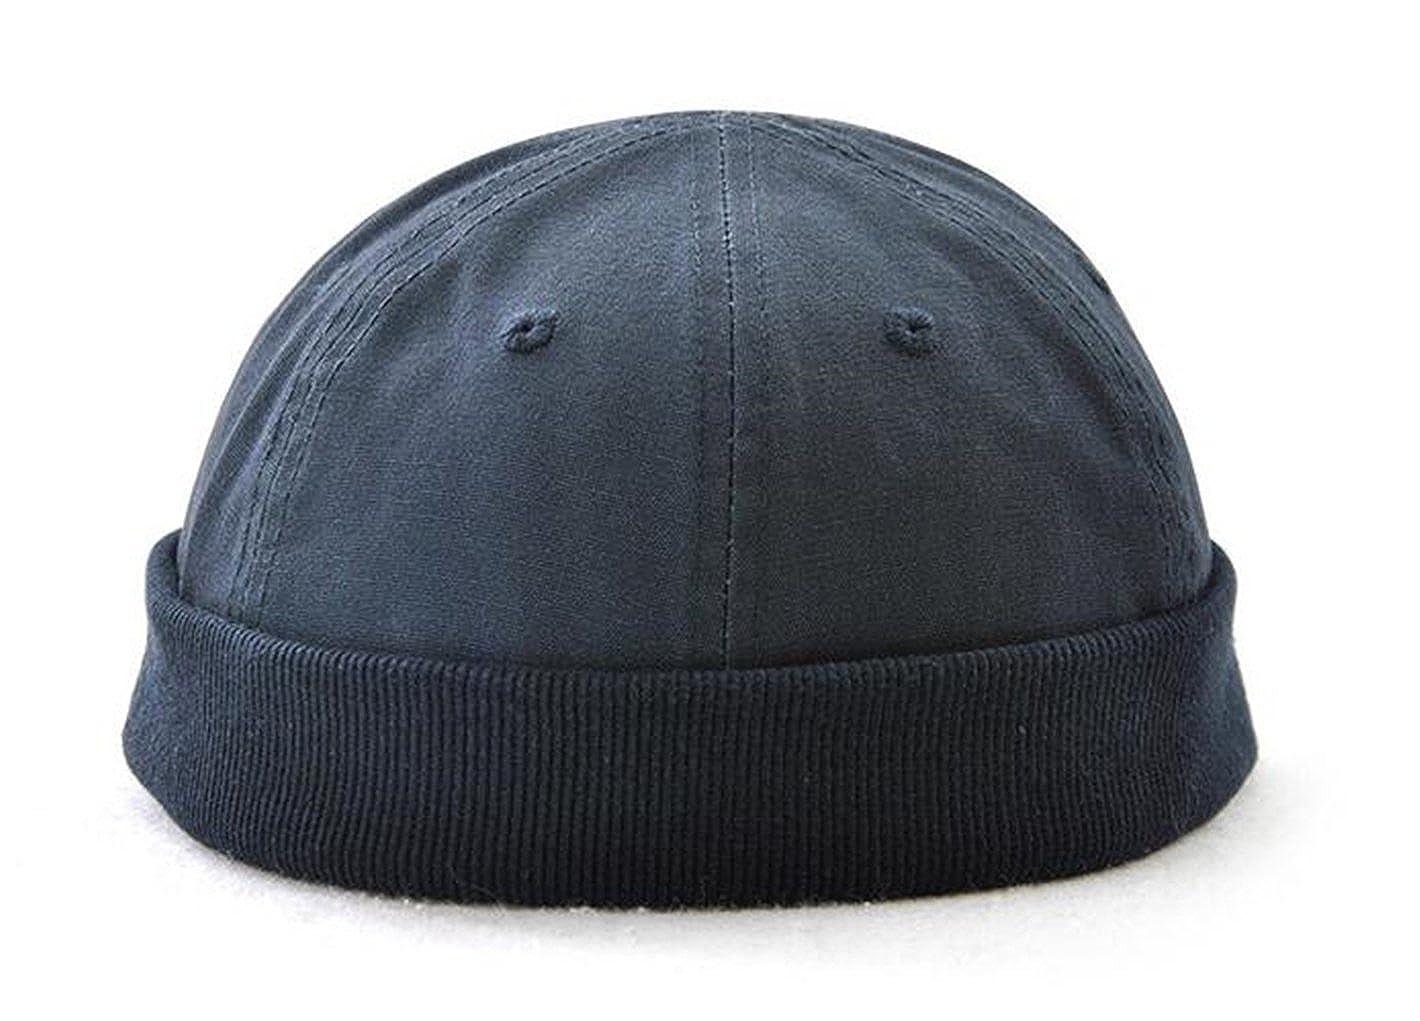 c65c2ac182e64 Amazon.com  Melii Cotton Kufi Hats Skull Docker Cap Solid For Men Teen  Boys  Toys   Games